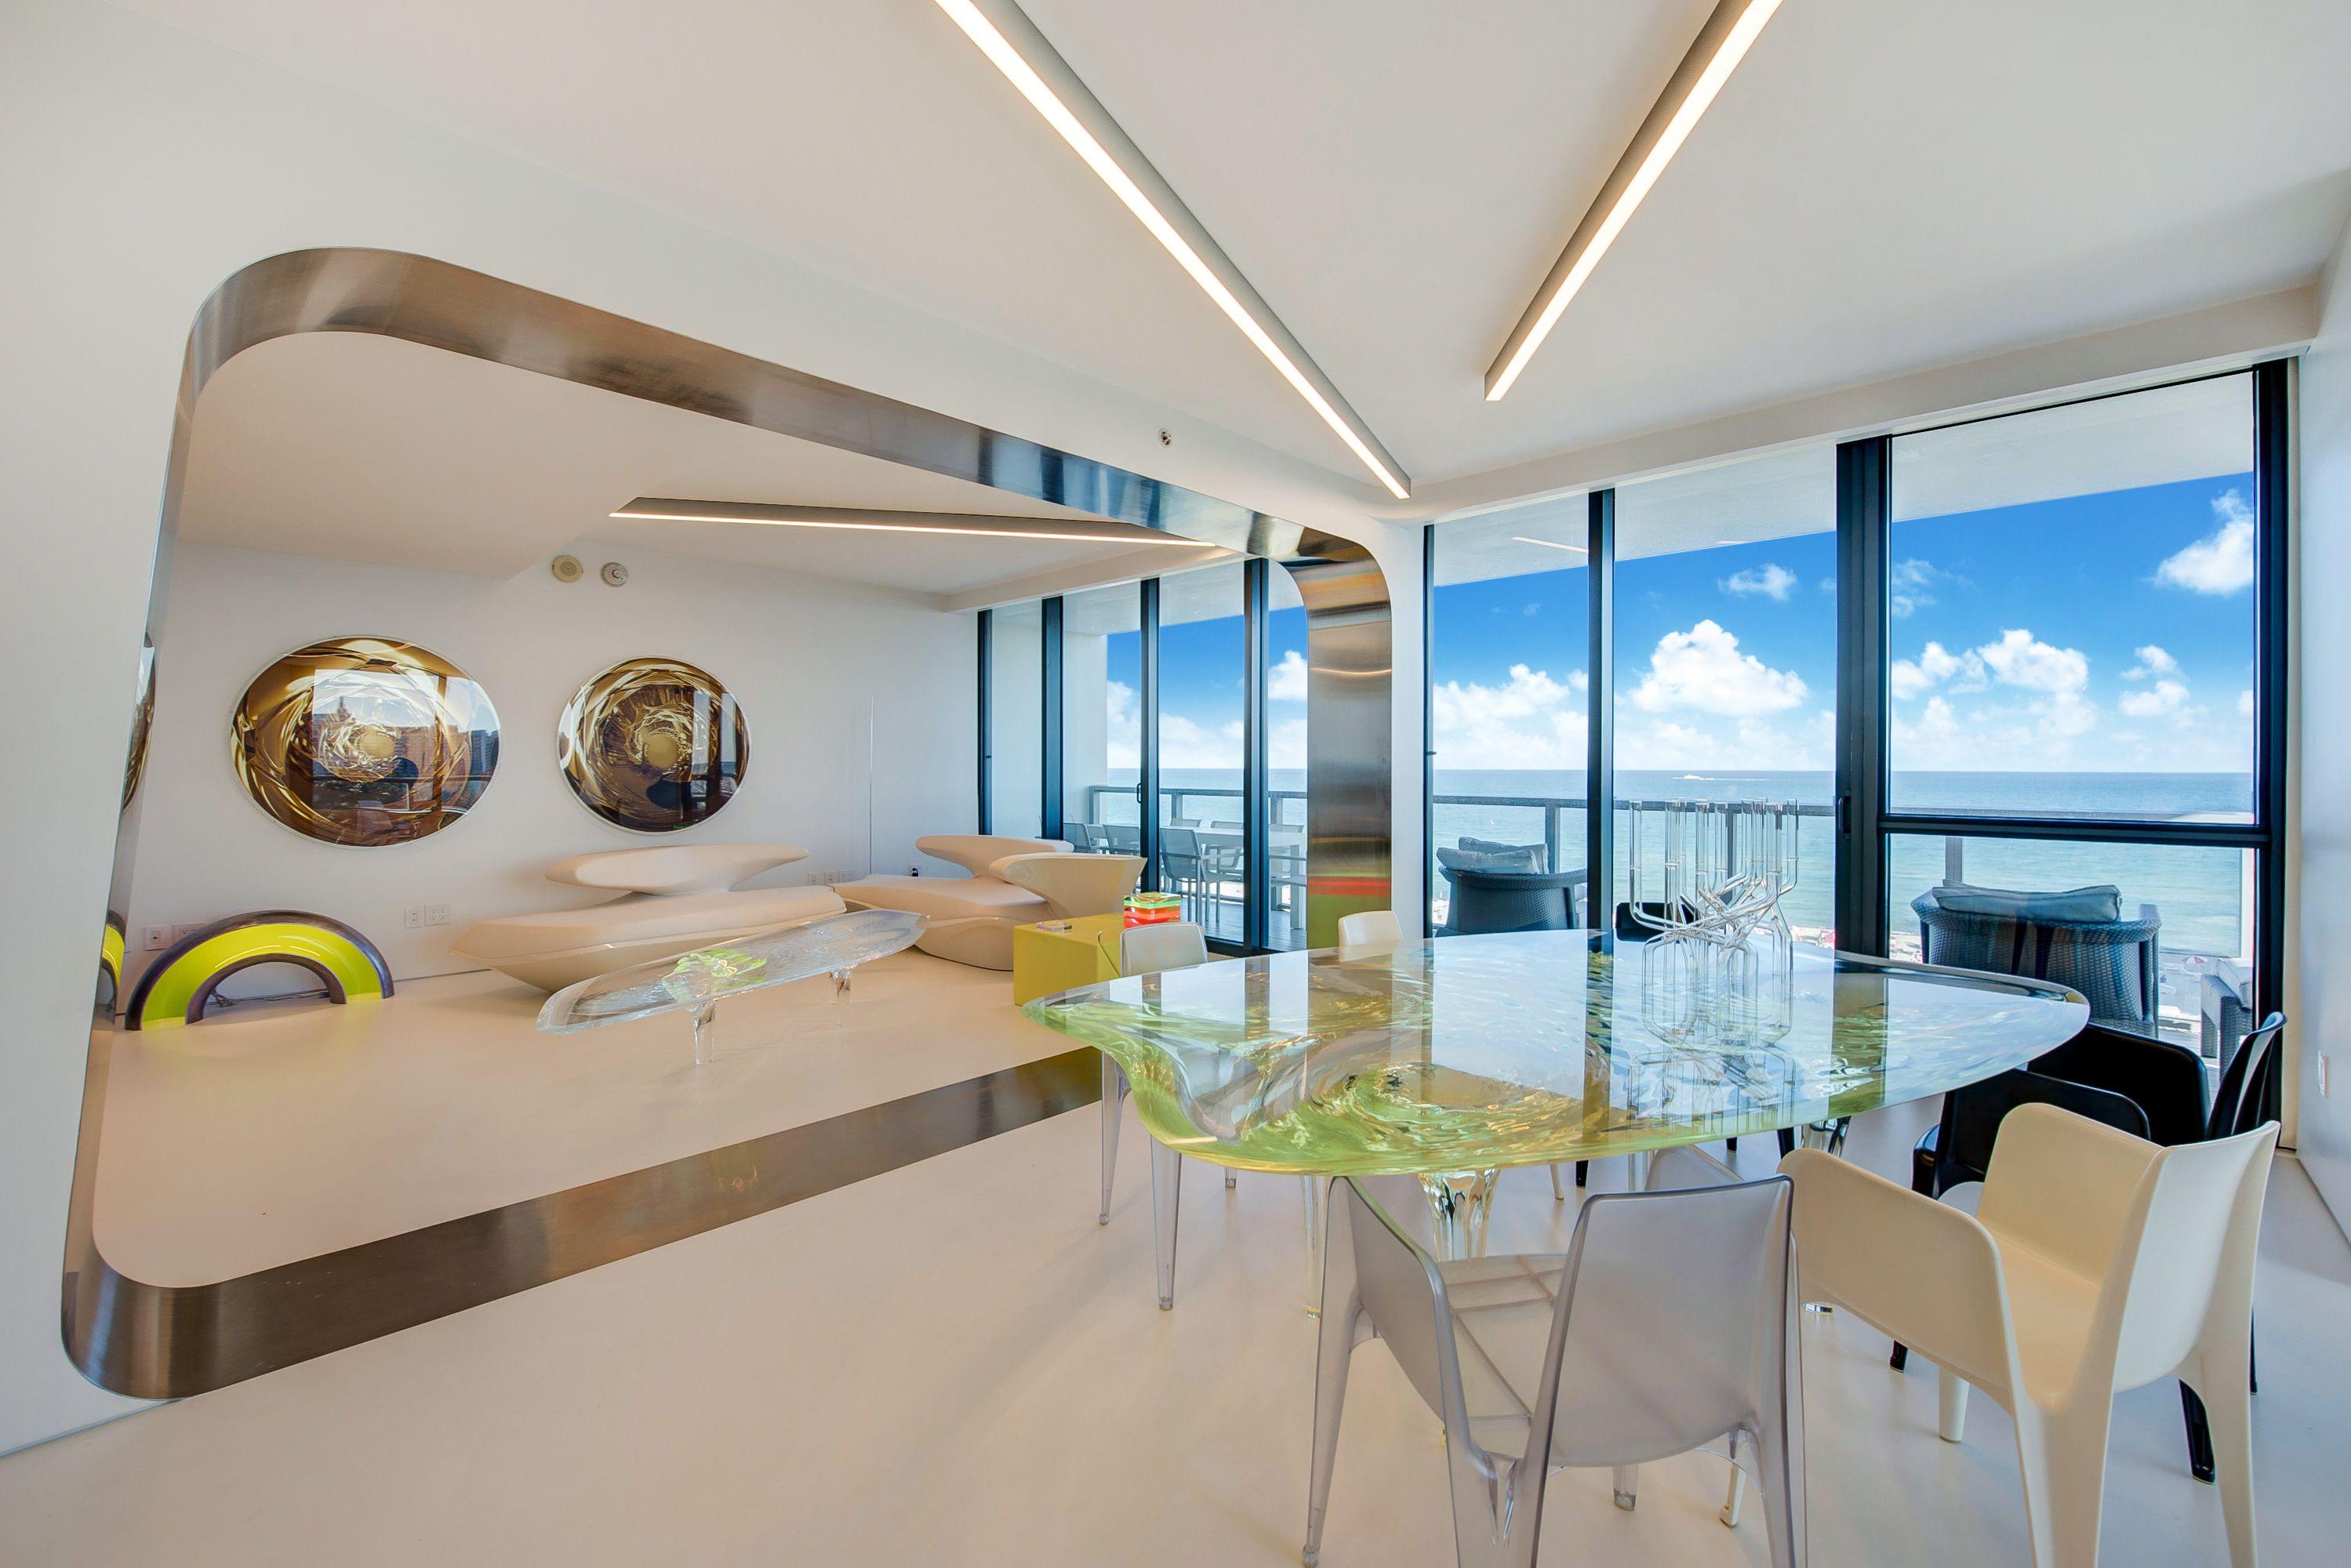 Zaha Hadid\'s Miami Home Sold for $5.75 Million - Zaha Hadid South ...